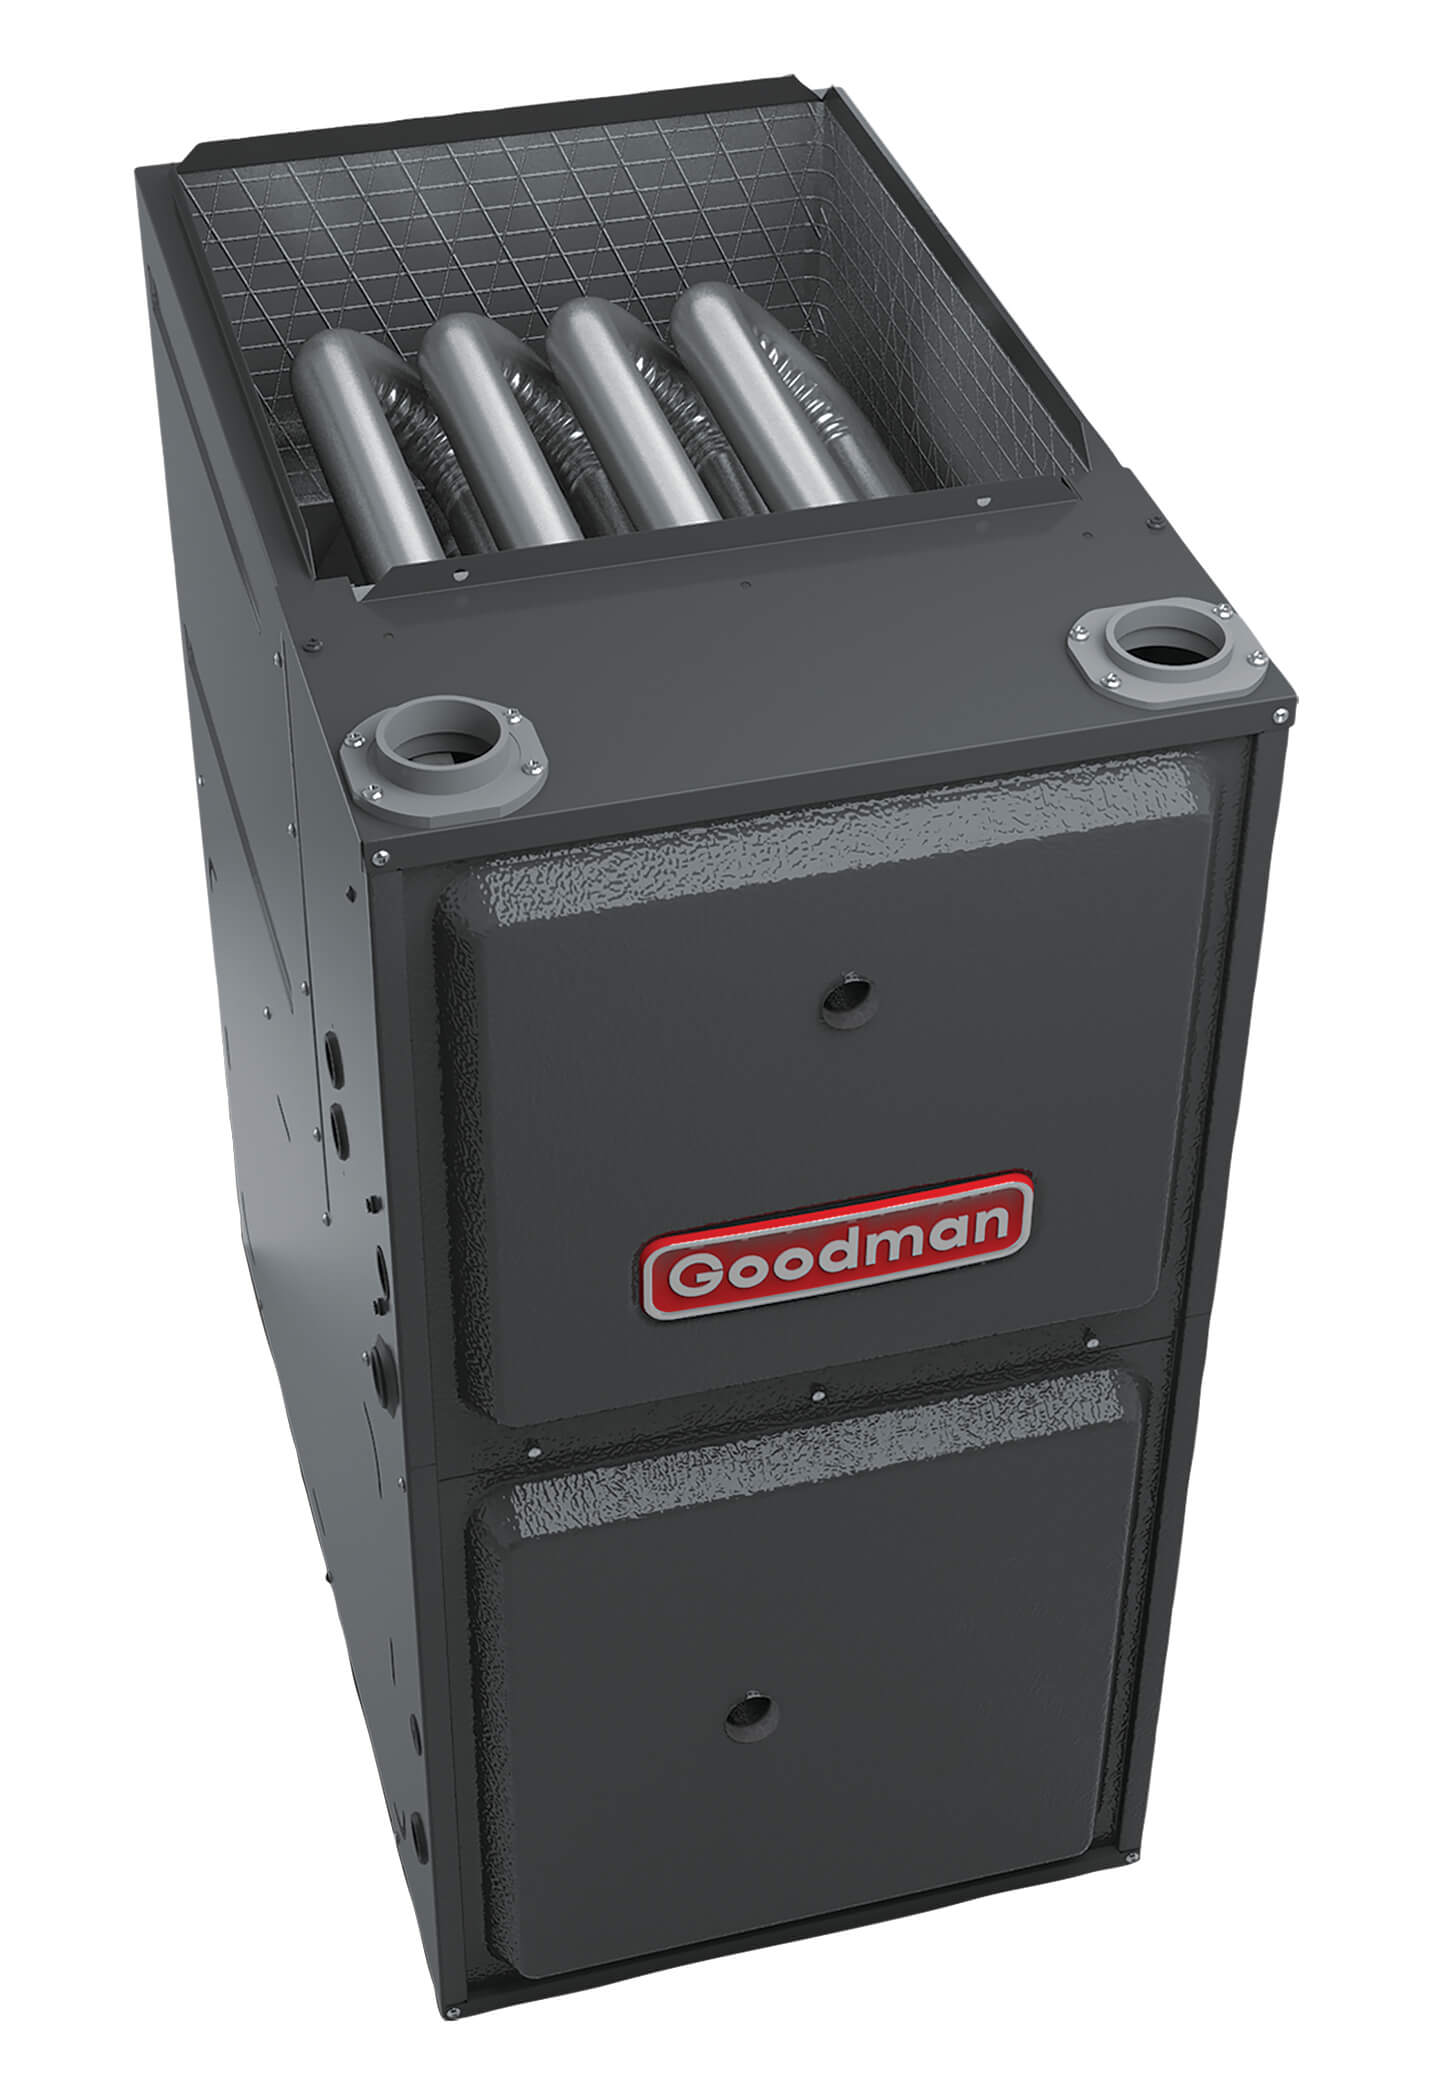 Gmss92 Goodman Single Stage Gas Furnace High Efficiency